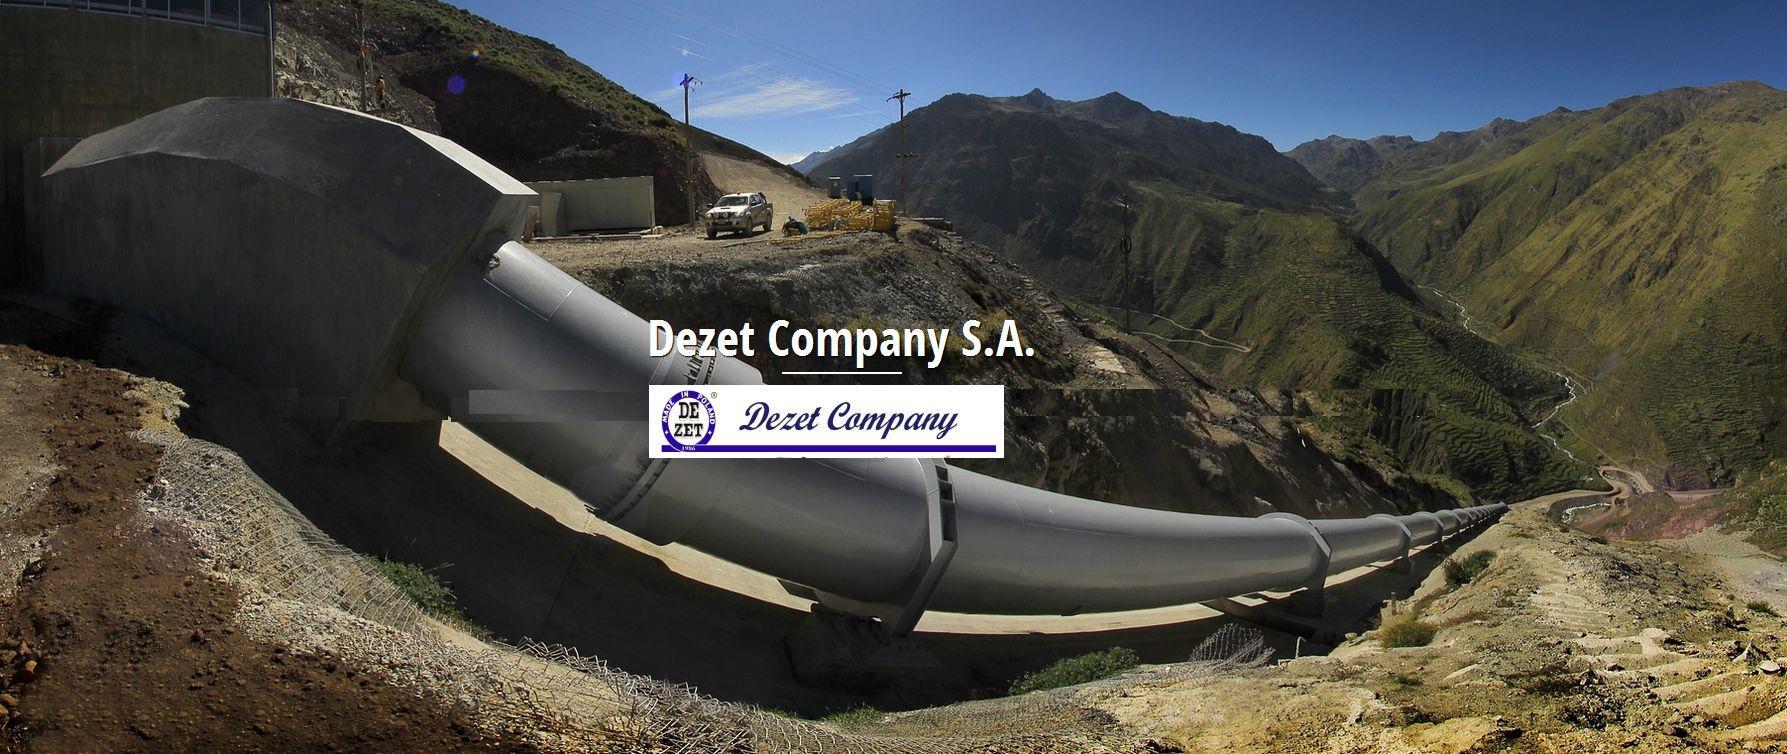 Dezet Company S.A.